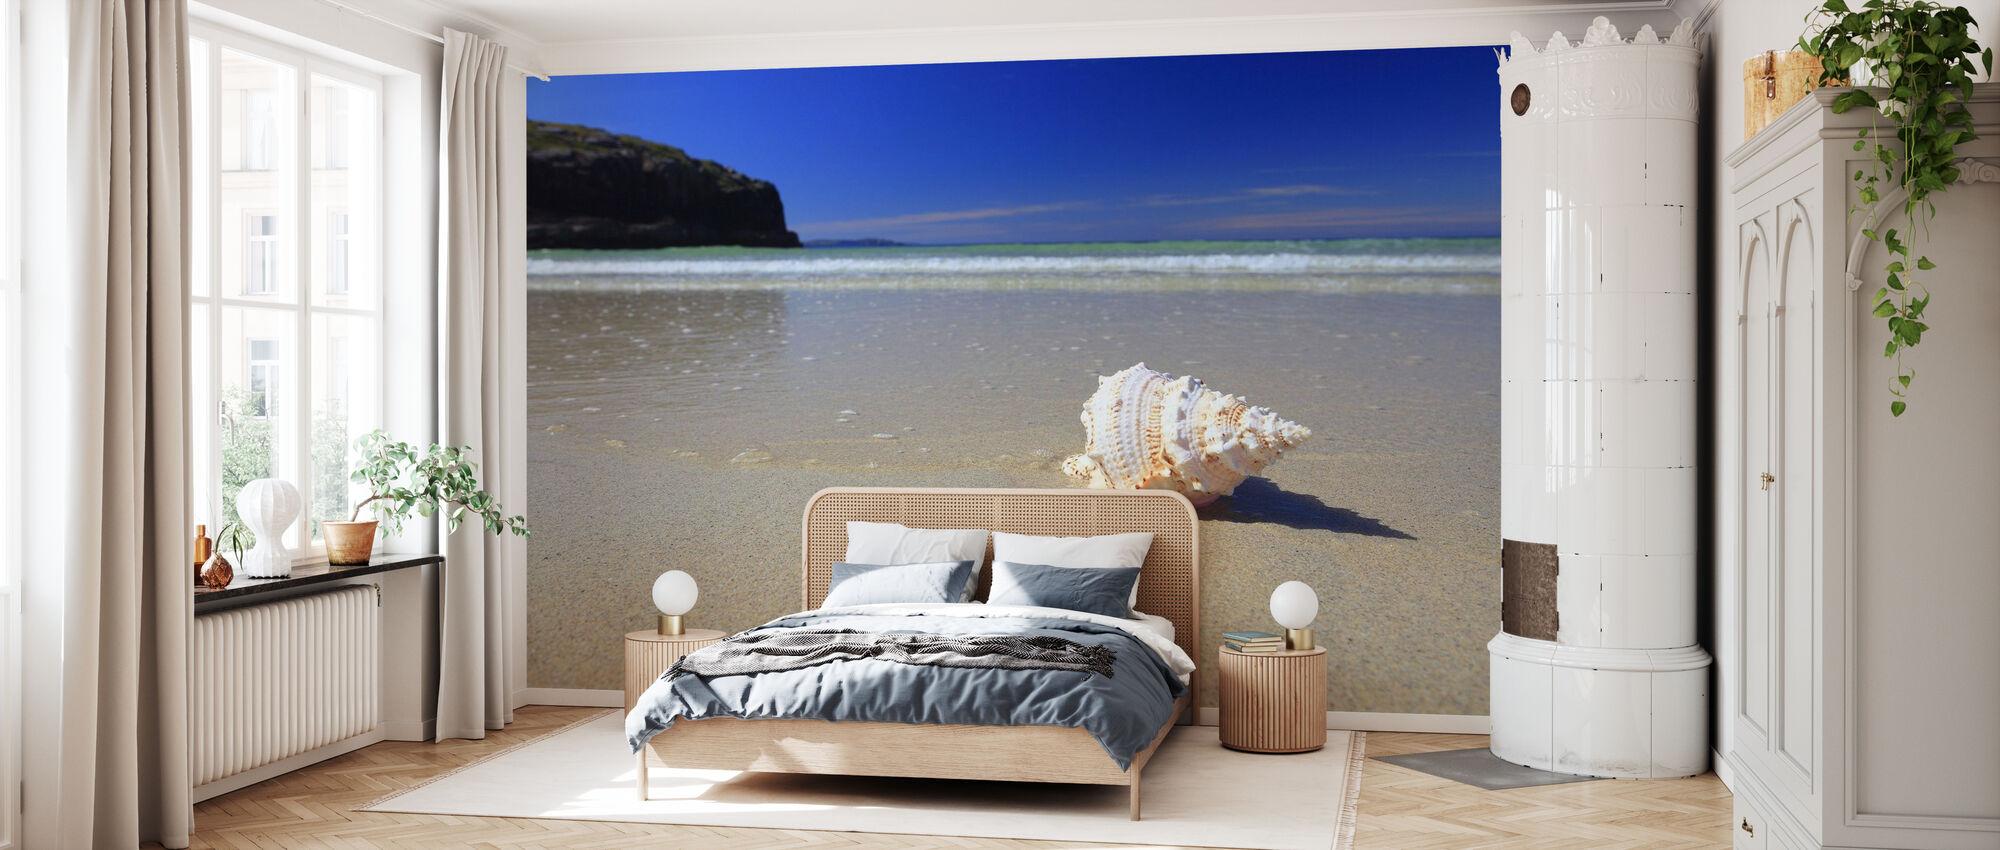 Shell on Beach - Wallpaper - Bedroom